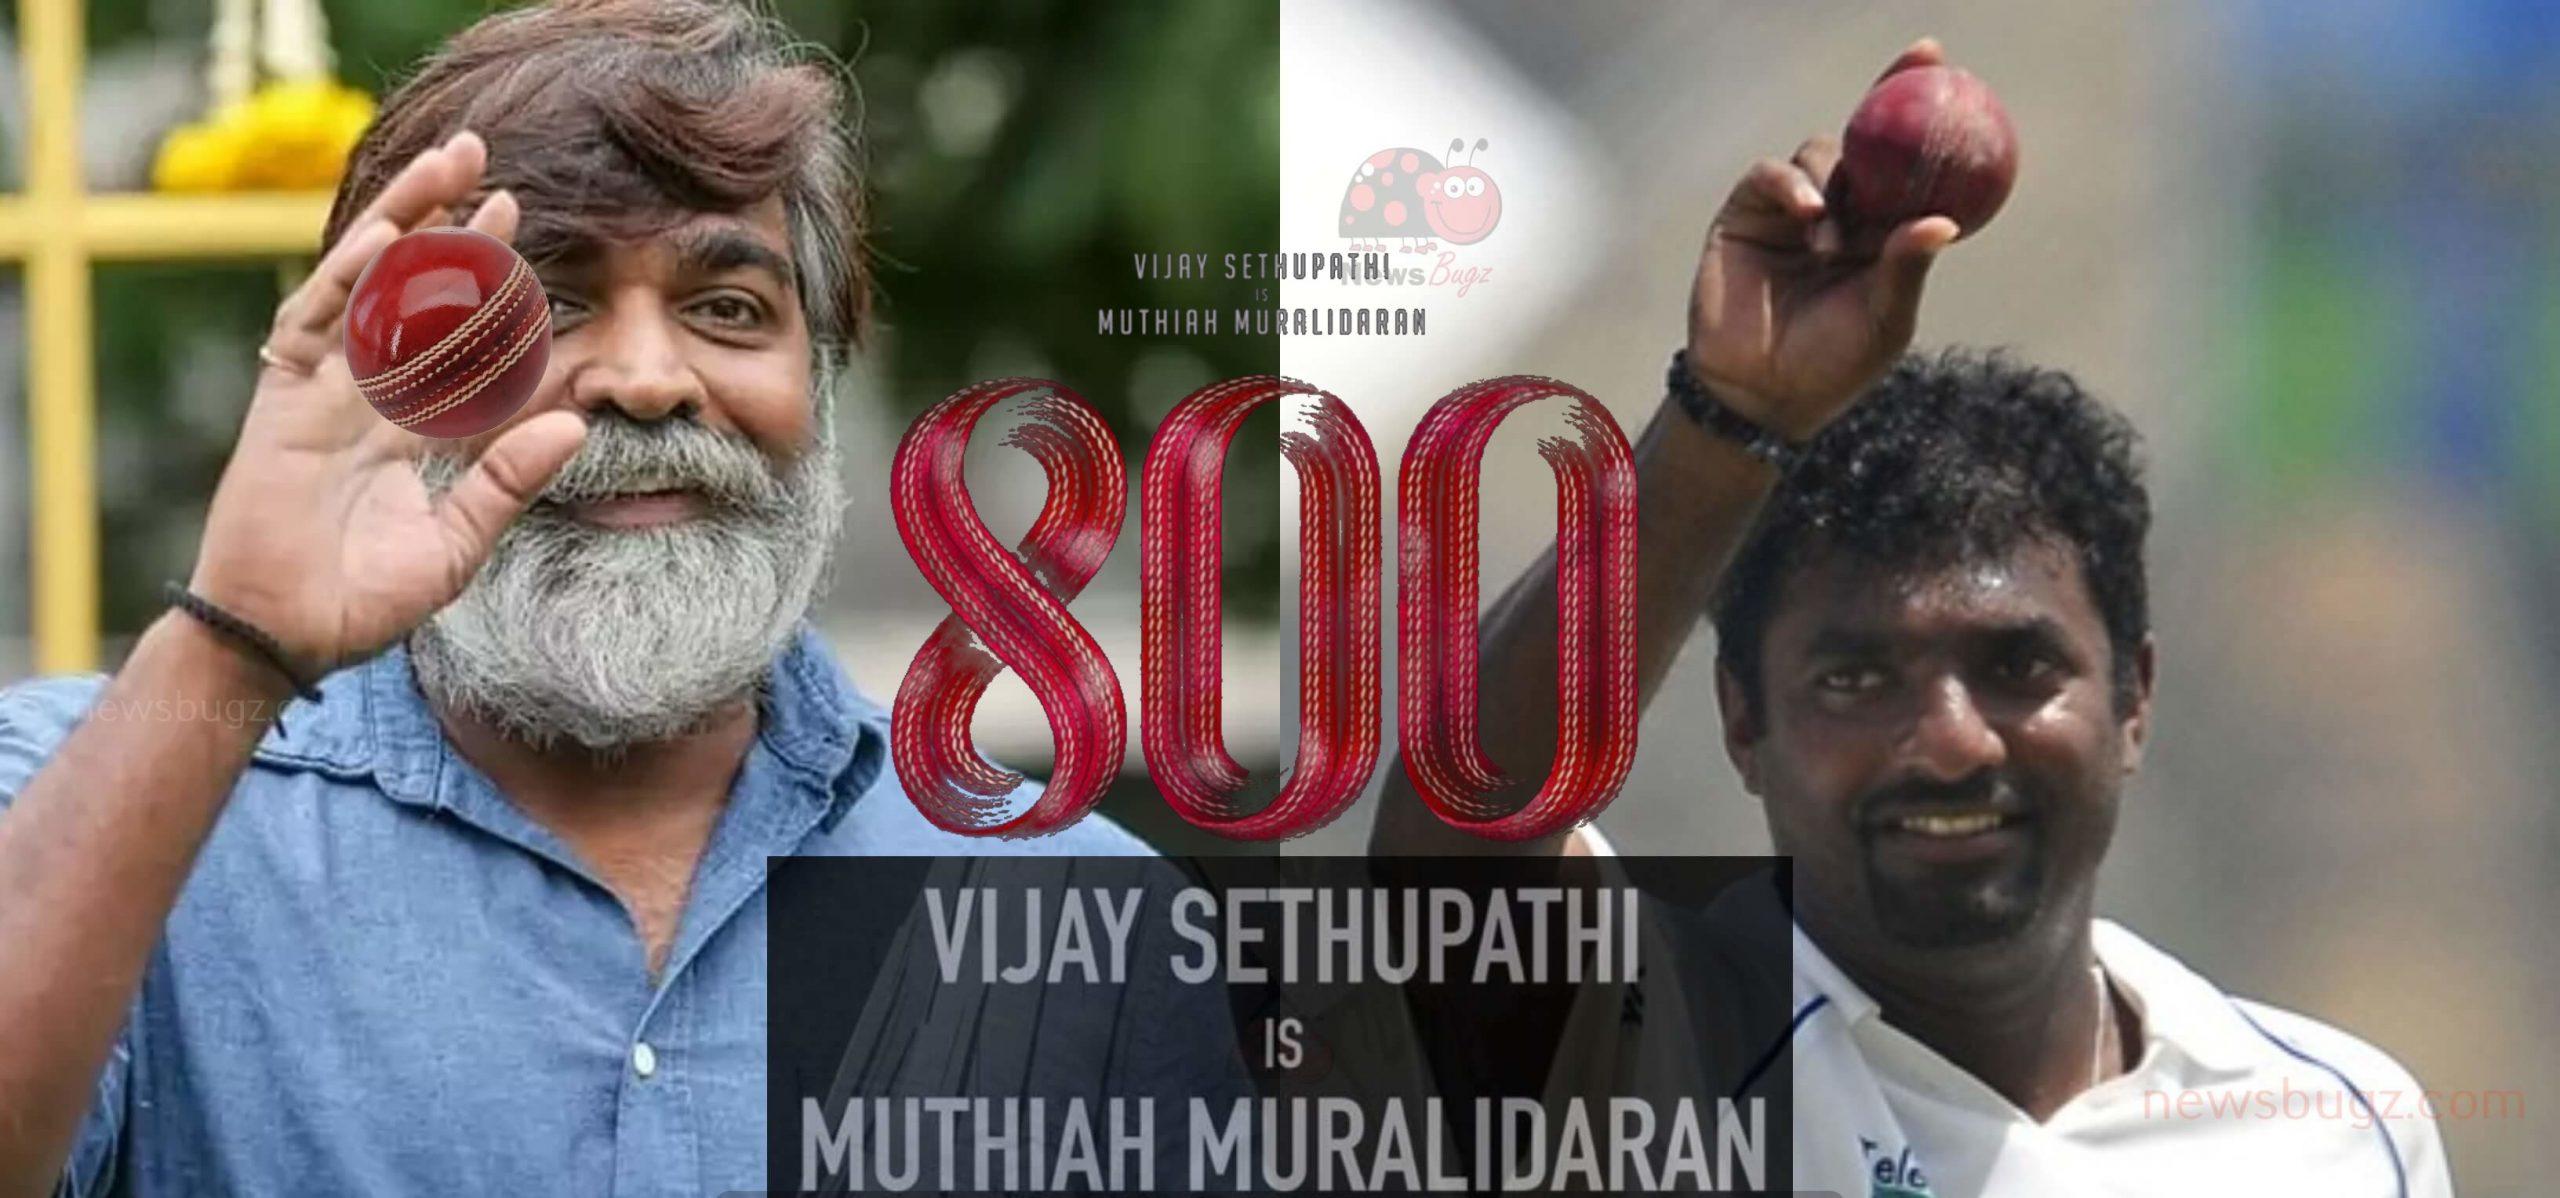 vijay sethupathi 800 movie